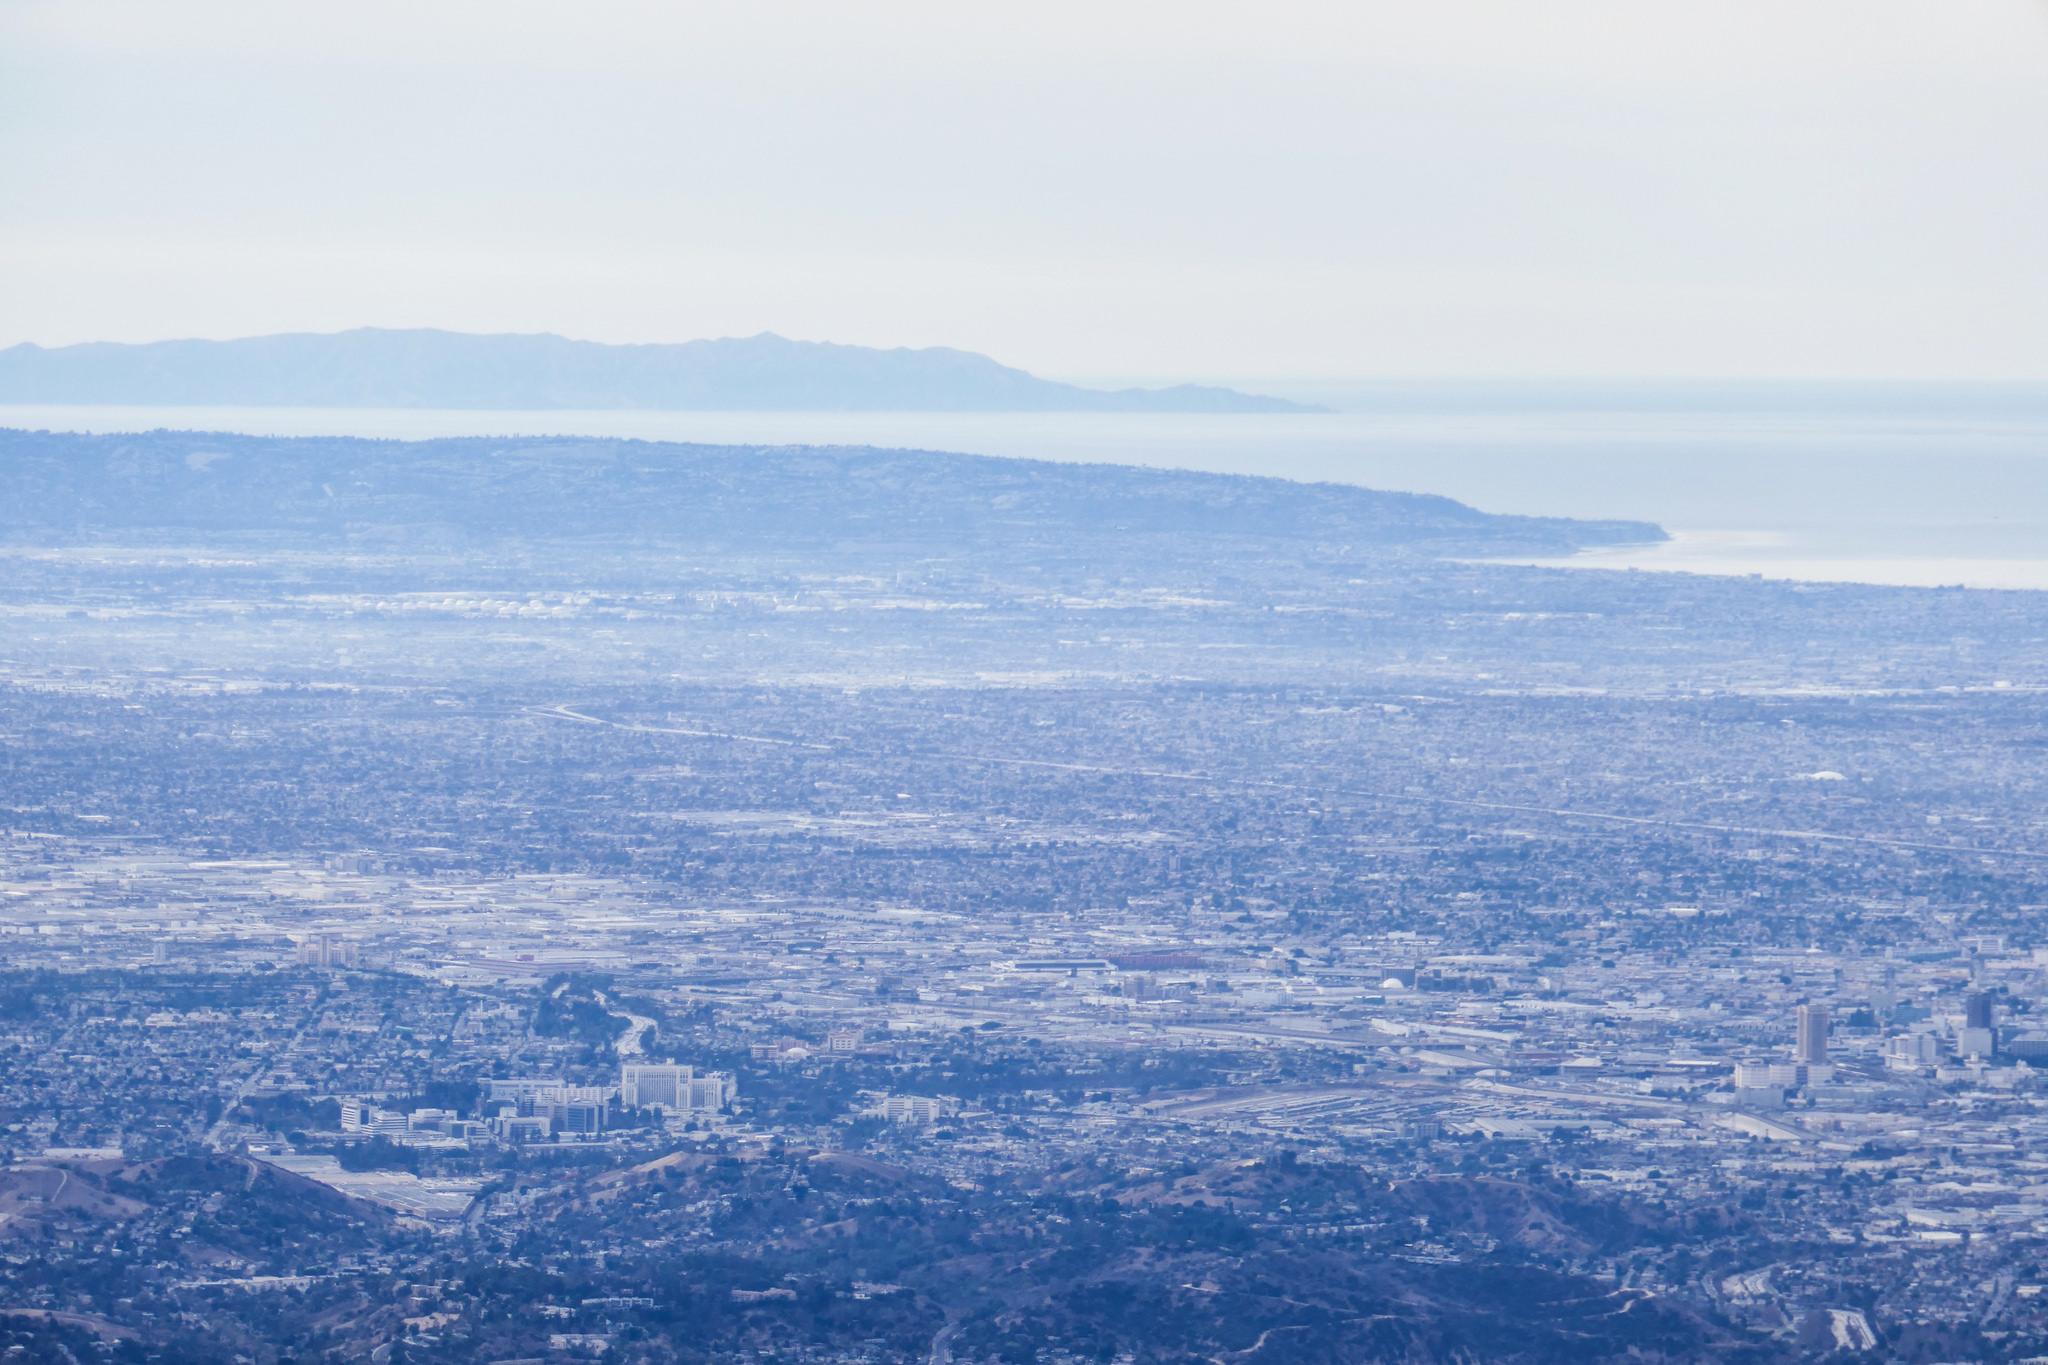 Catalina island is visible.